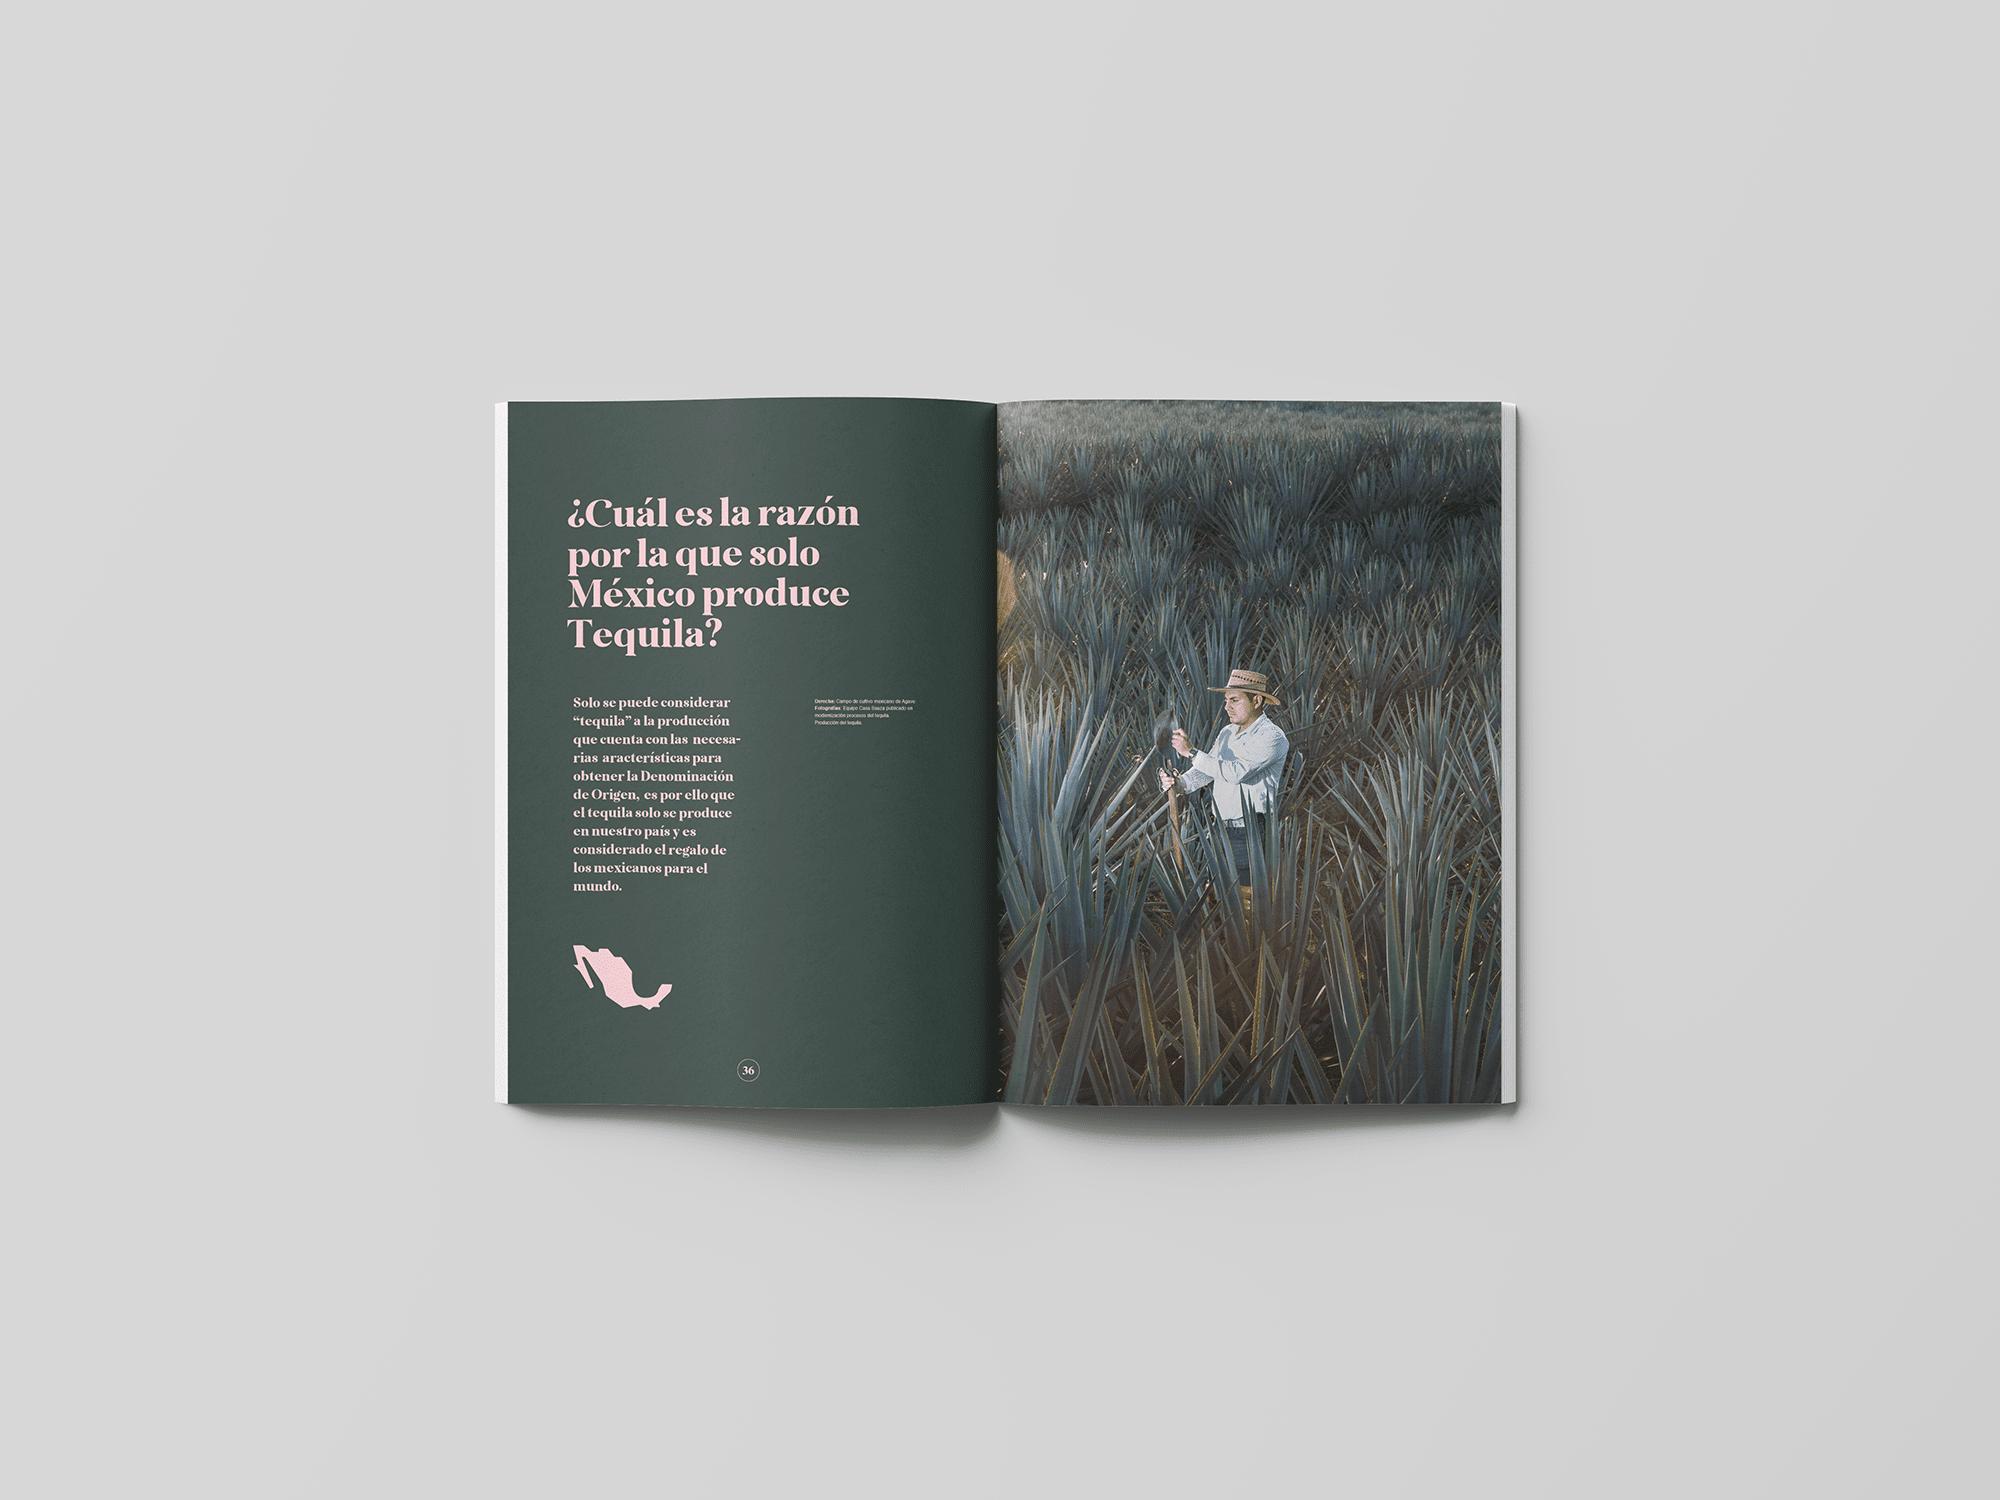 spread-13-book-agave-yoenpaperland